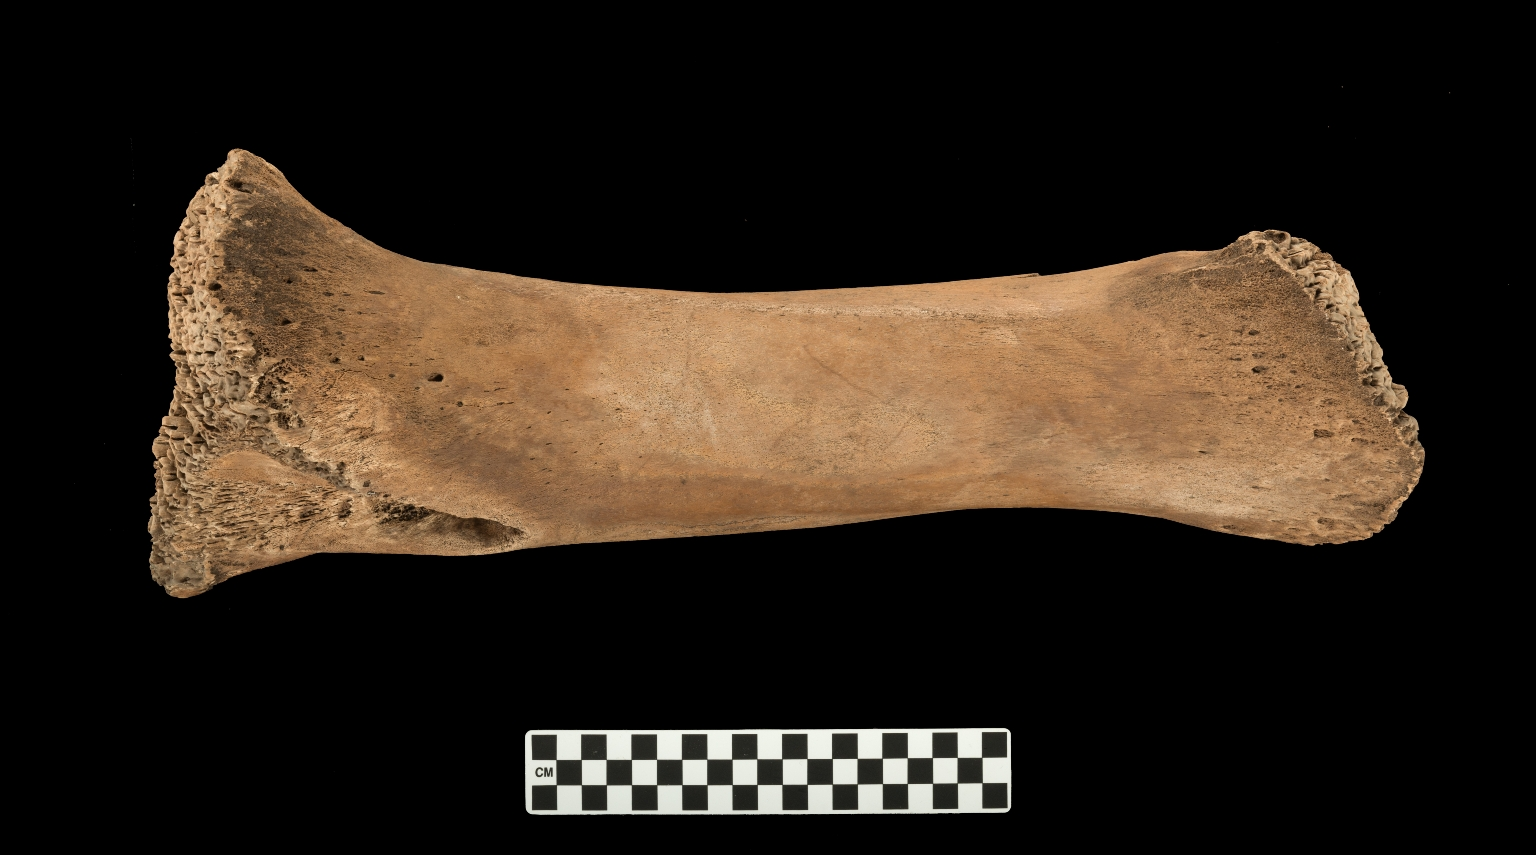 Mammuthus columbi skeleton